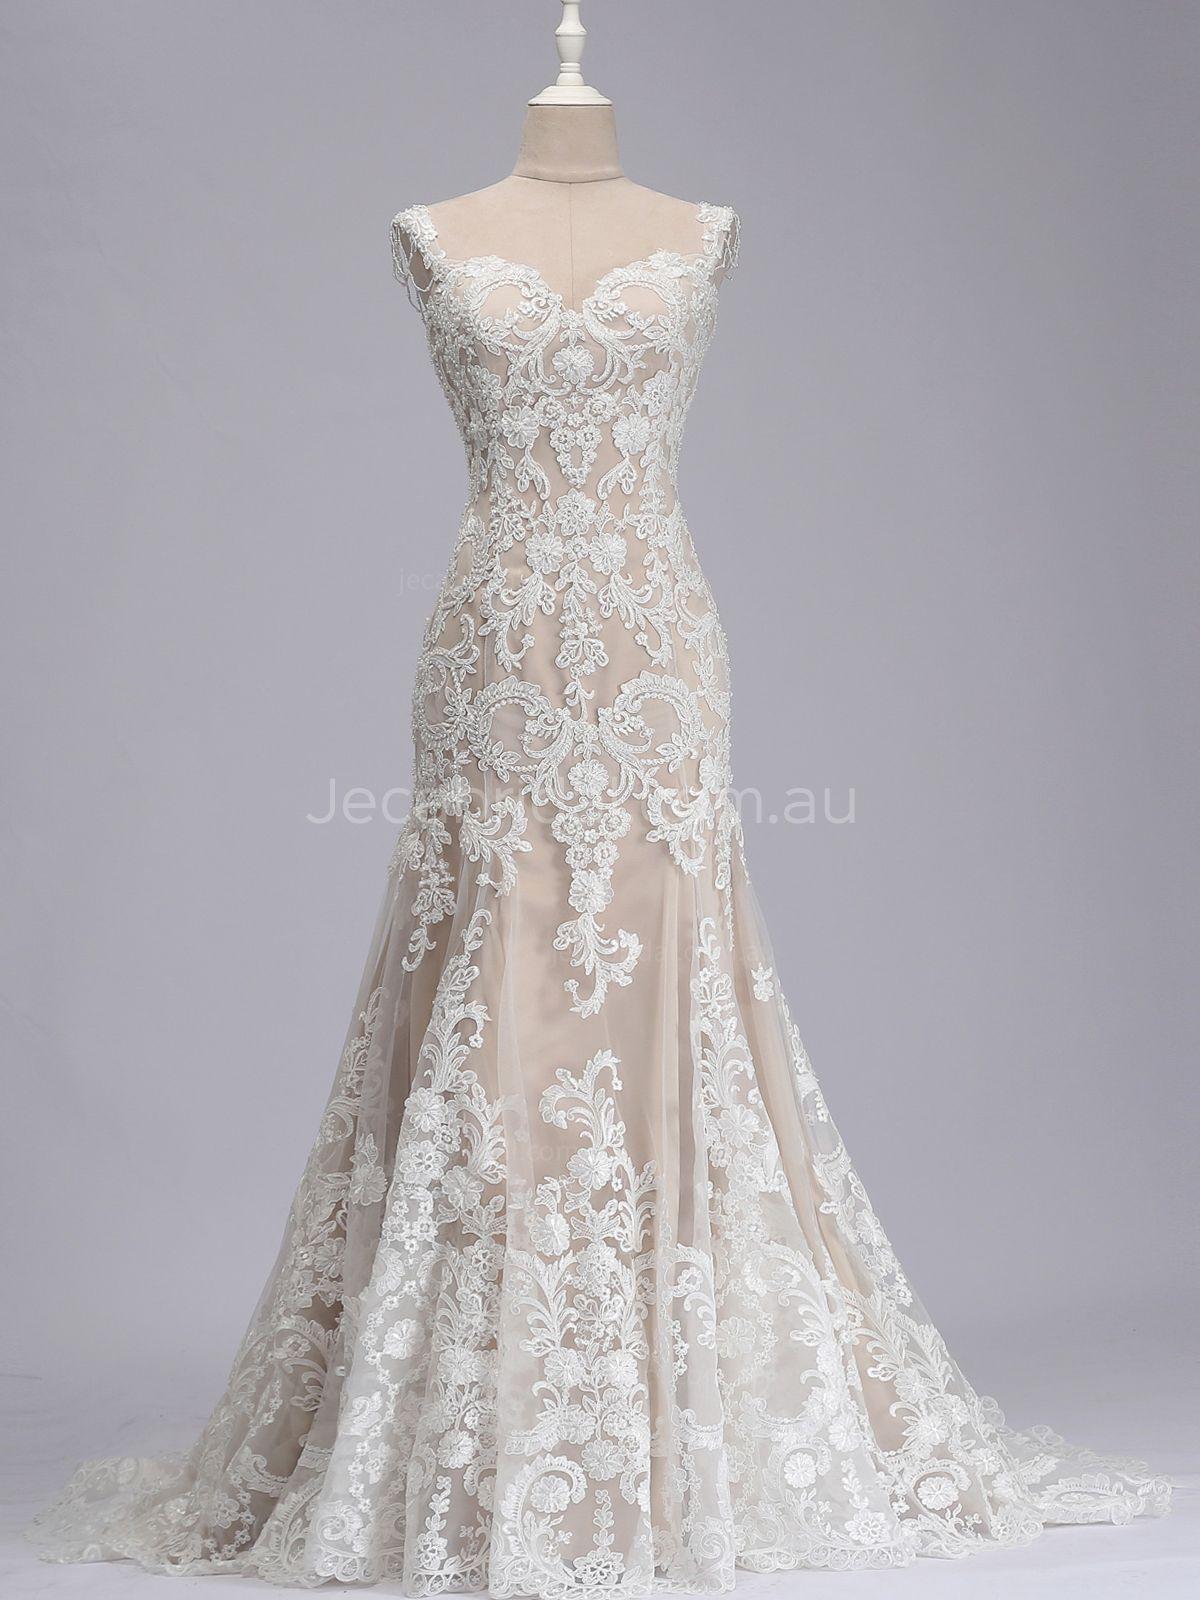 Sweetheart Neckline Beaded Straps Champagne Wedding Dress W1088 - Front